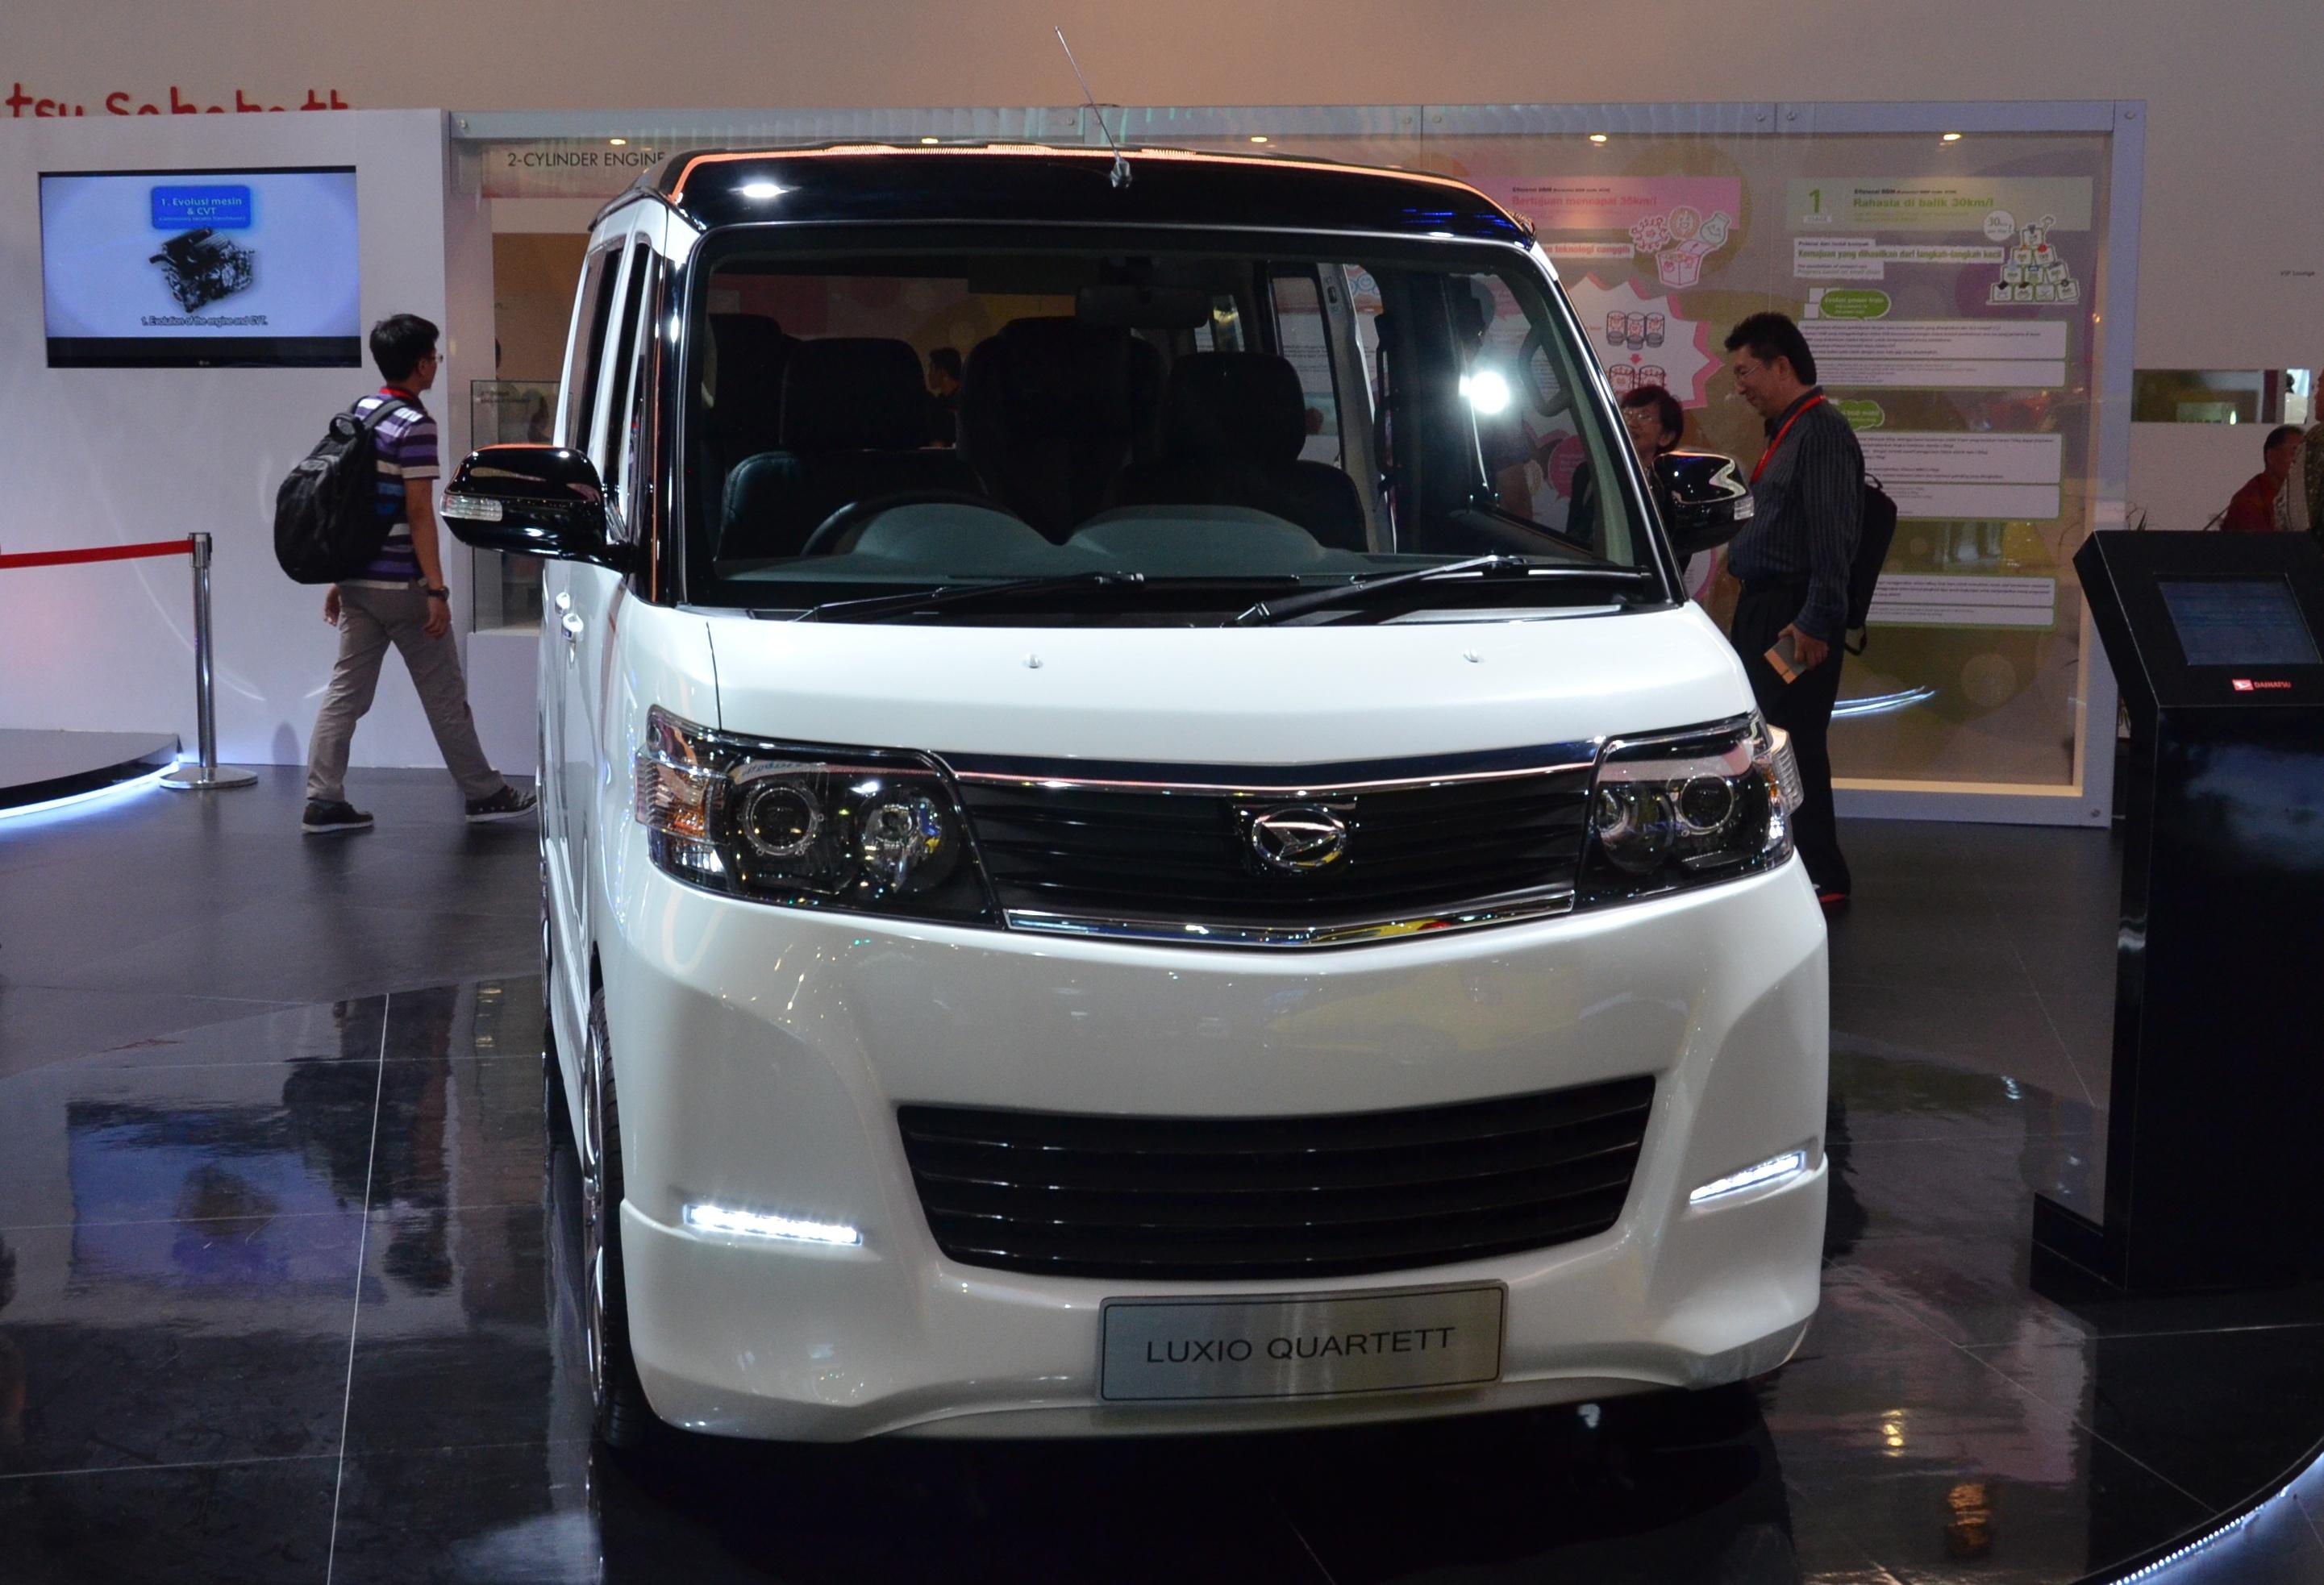 Harga Jual Daihatsu Luxio Models By Year Rent Car Wiring Diagram Quartett Ample Space For Four Paul Tan